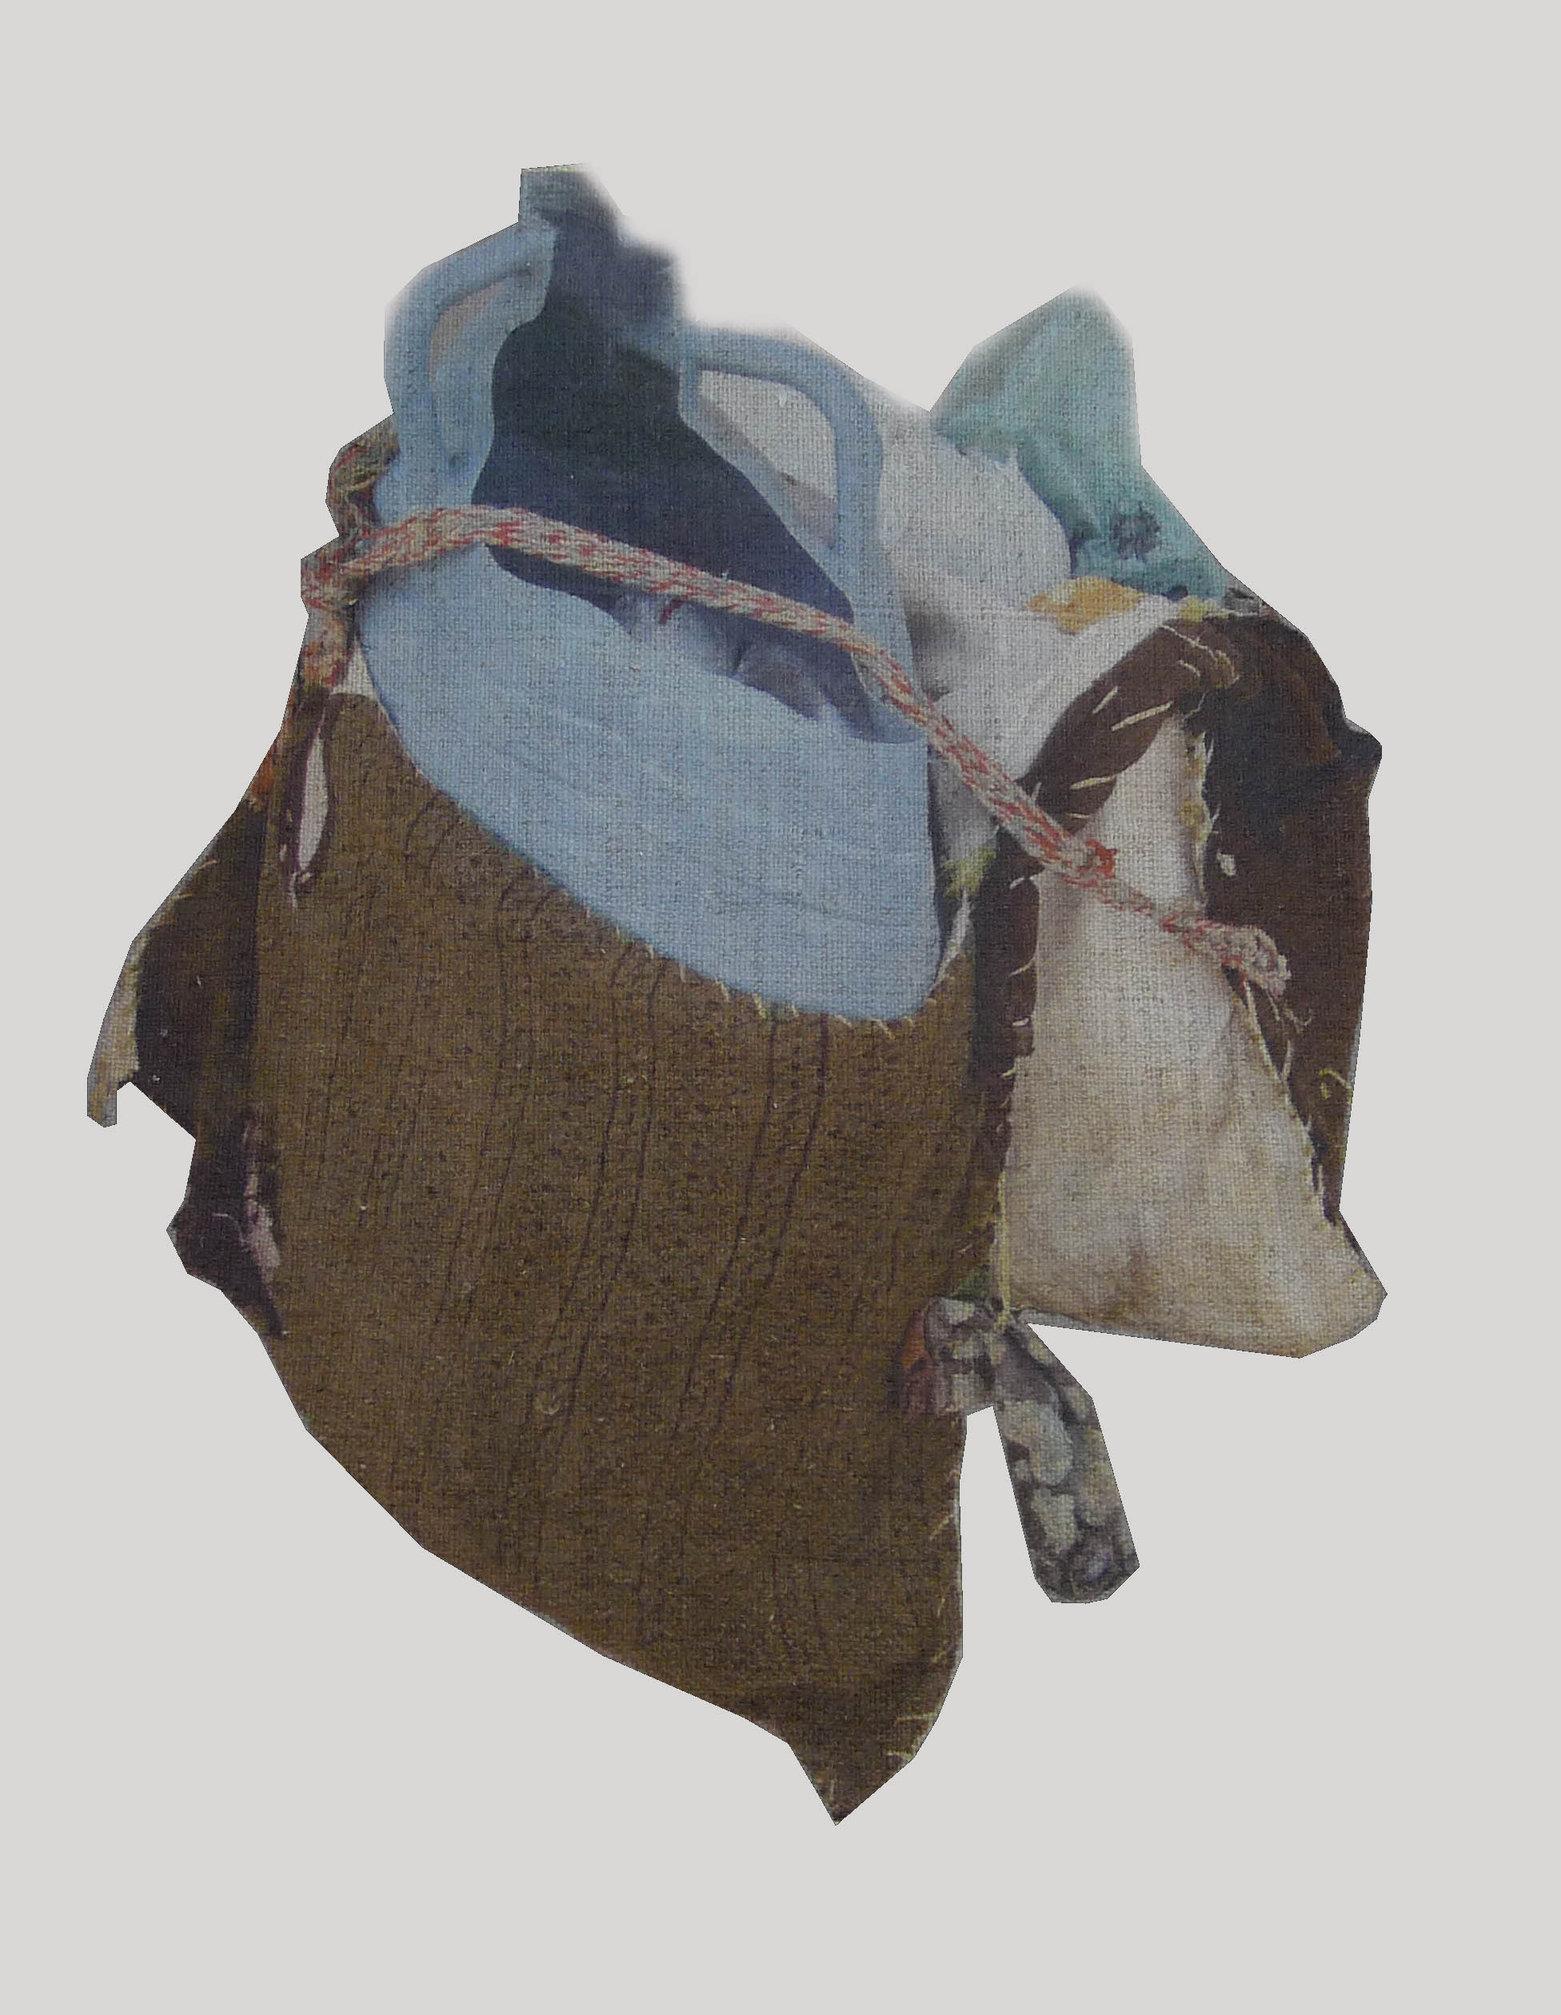 Ellert Haitjema, Personal Belongings, 2014